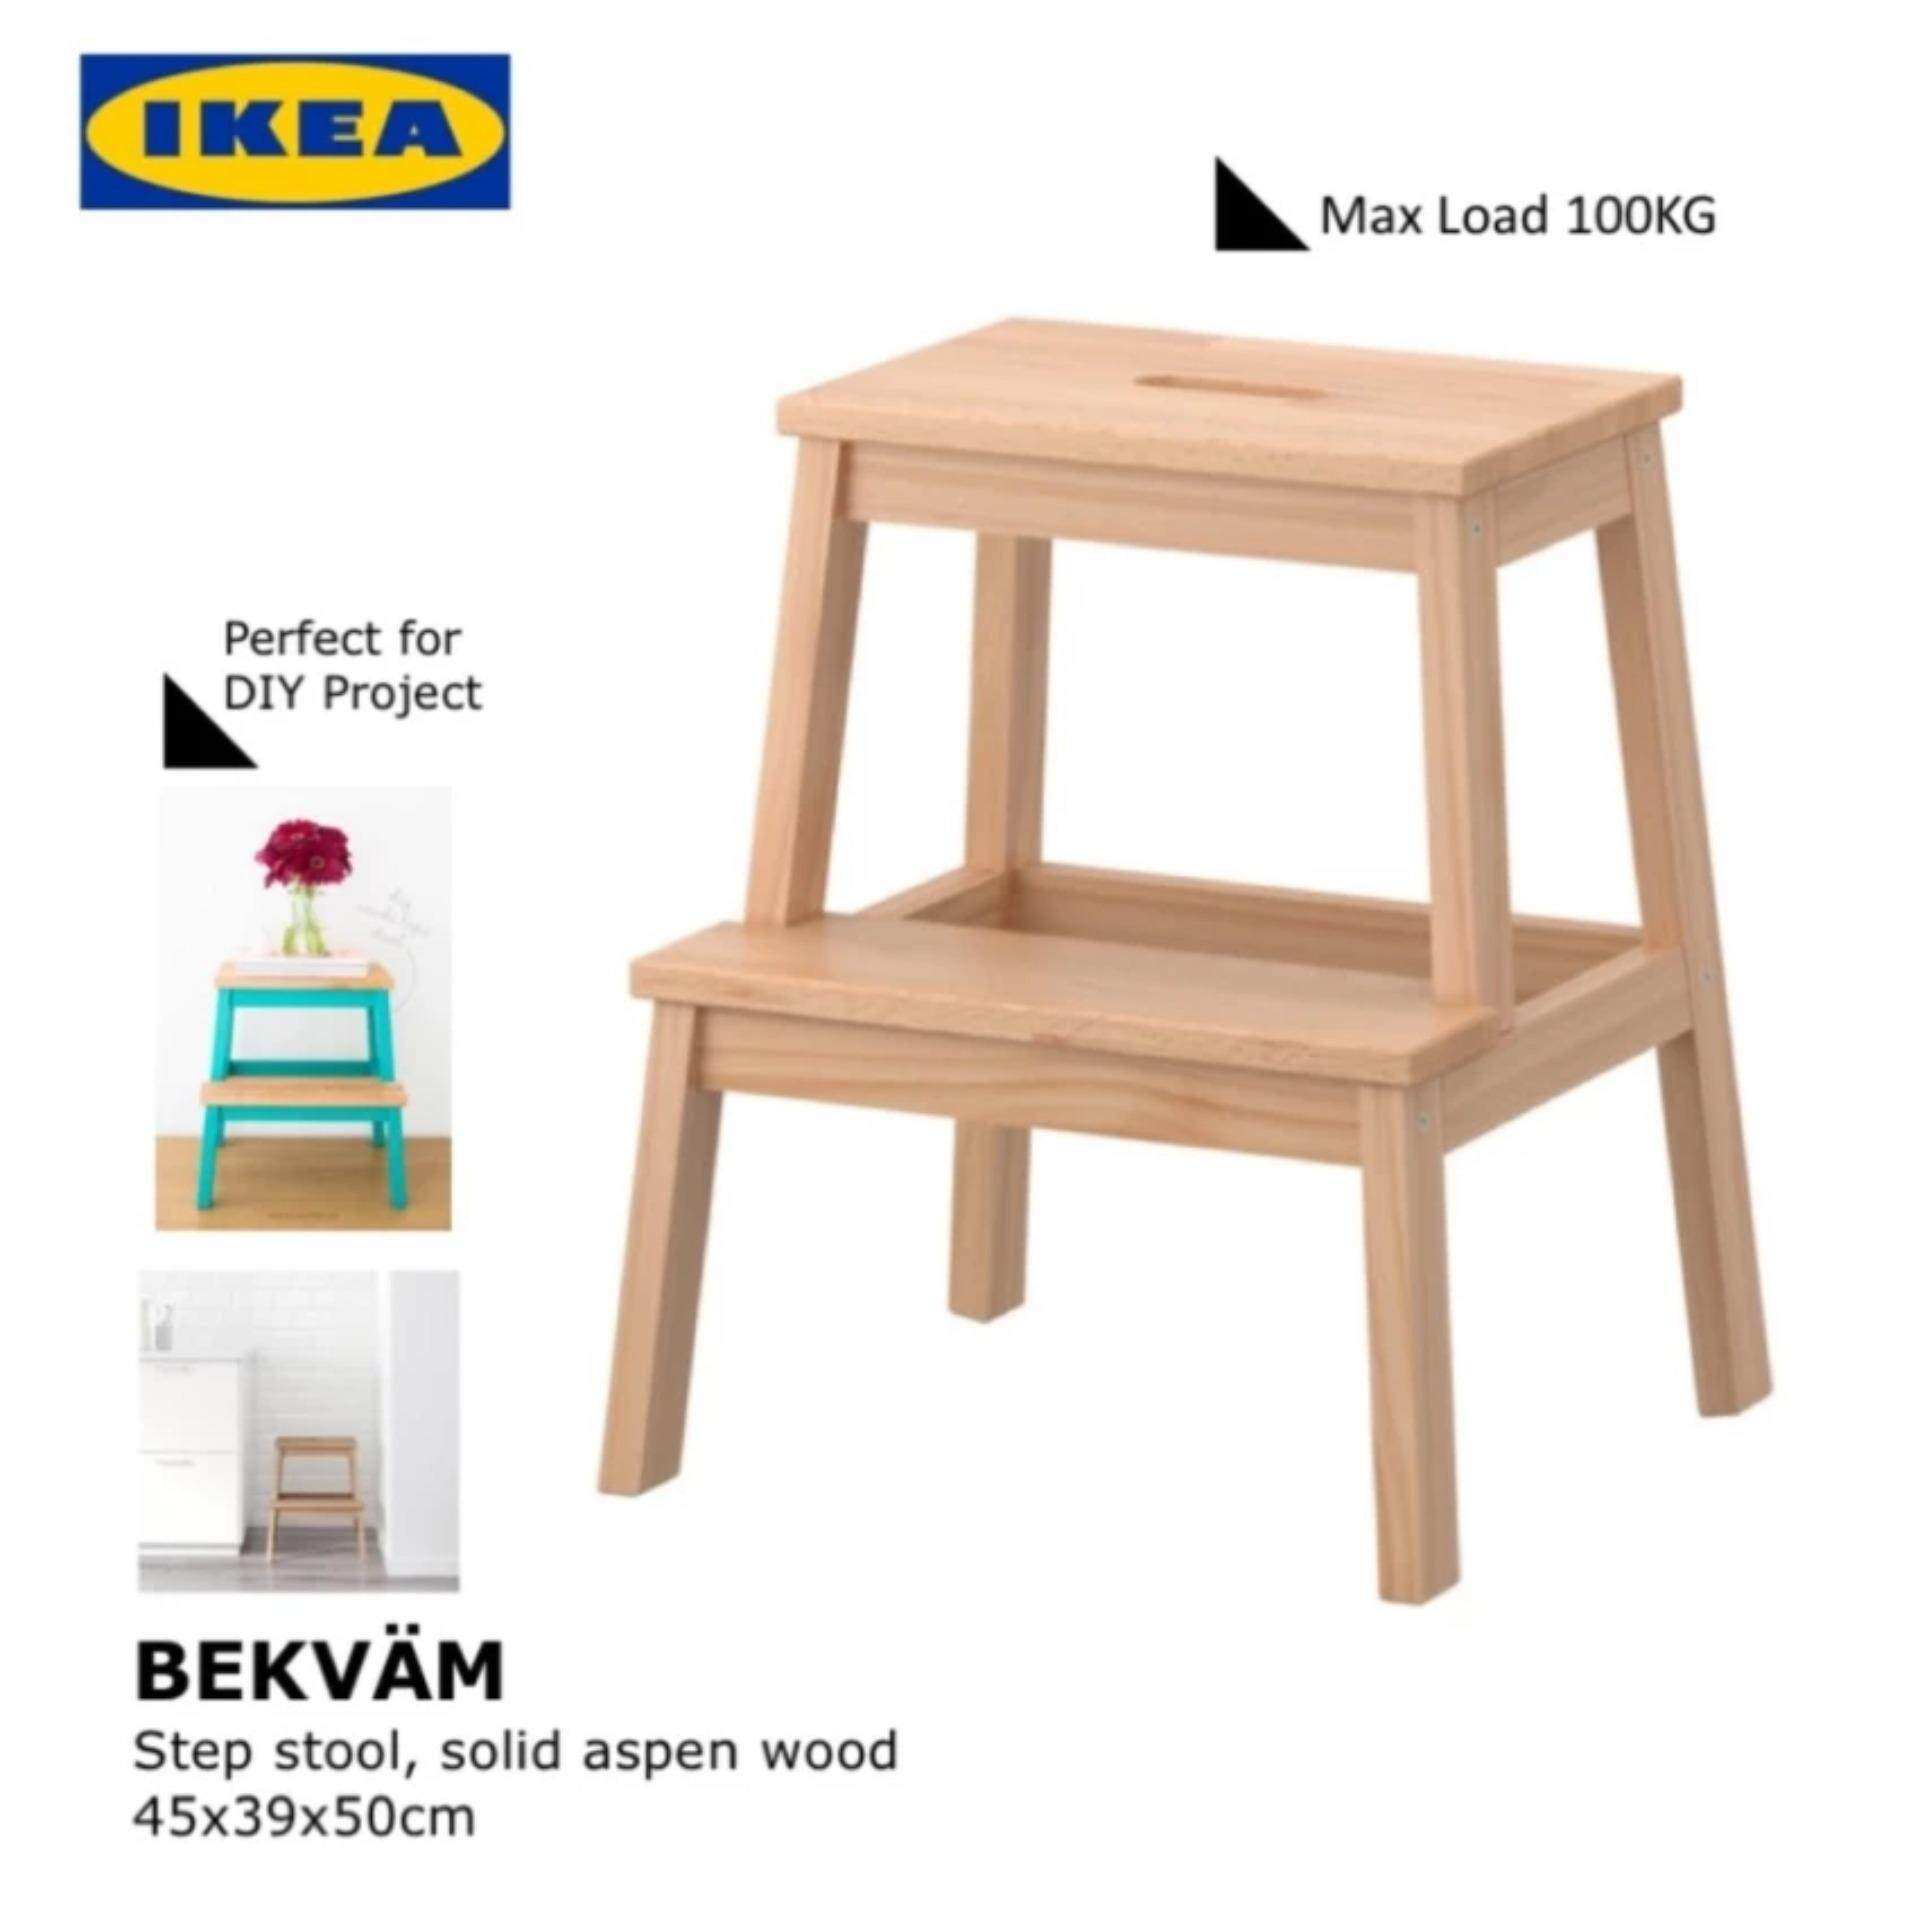 Buy IKEA BEKVAM Multipurpose Step Stool, Aspen Max Load 100kg, 45x39x50cm  Malaysia